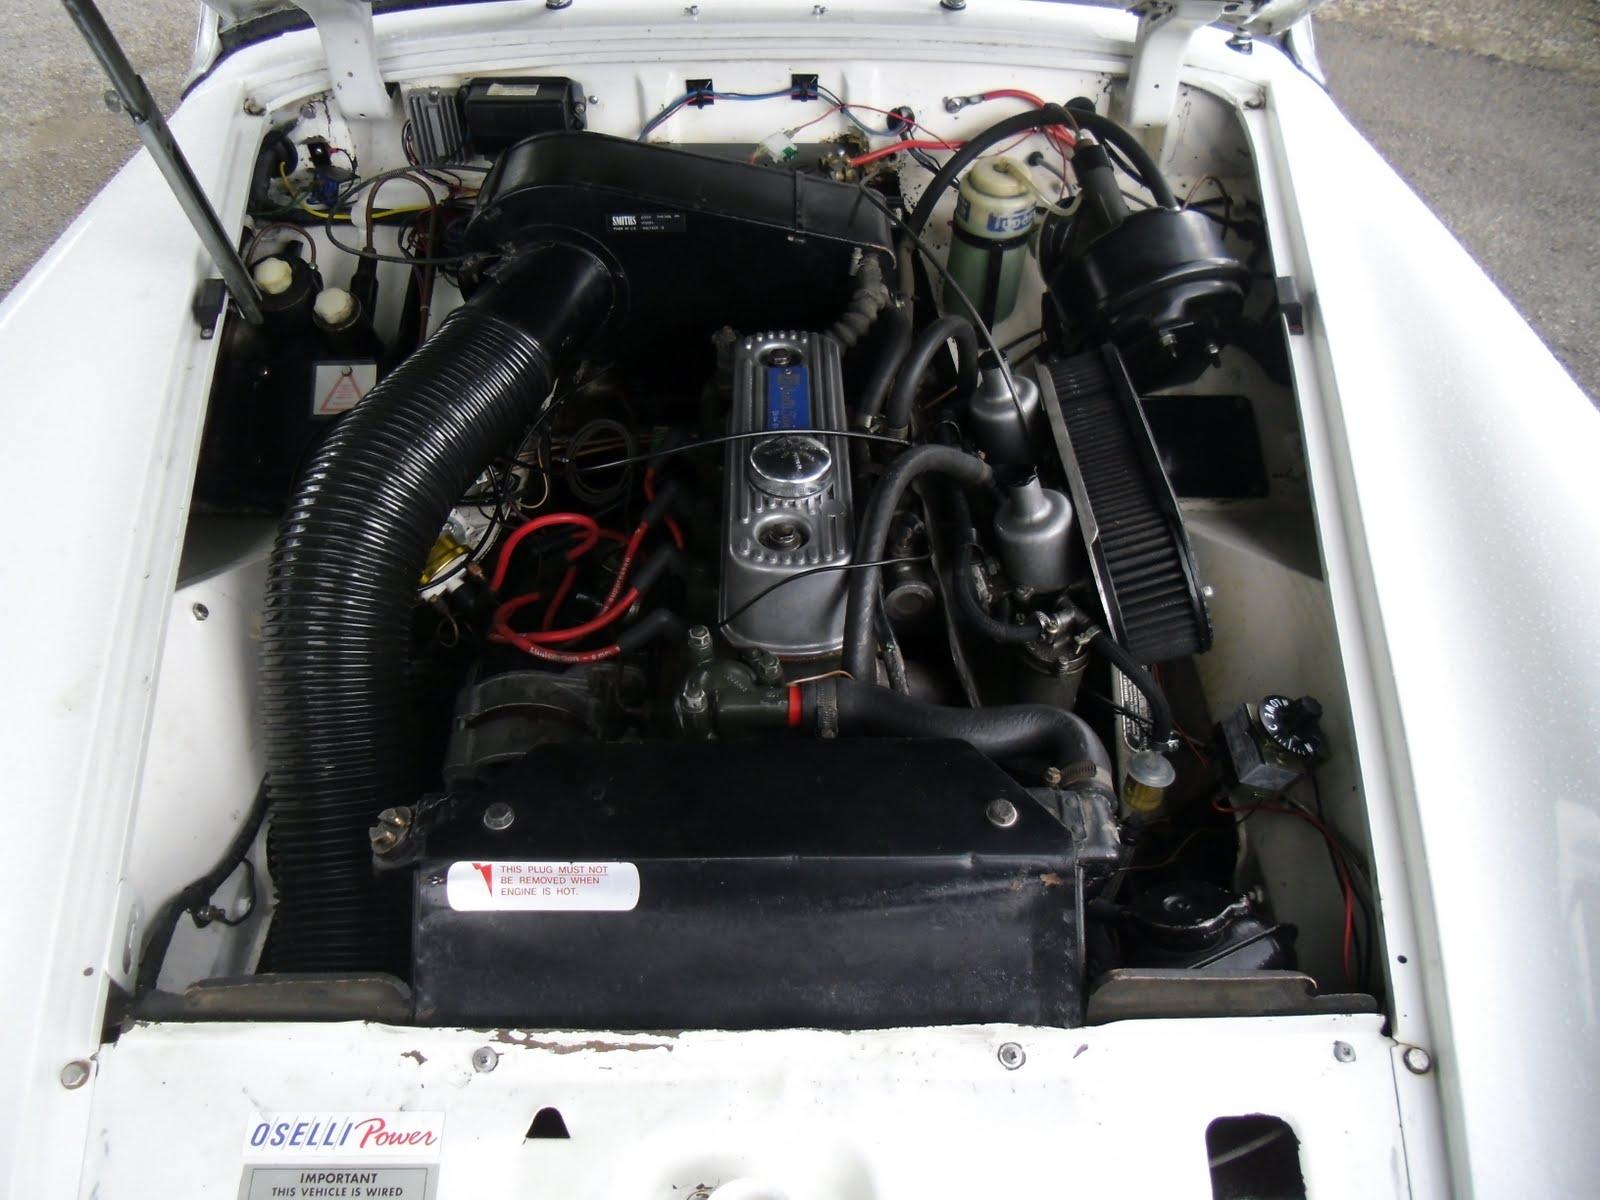 midget a series main bearings same as mini